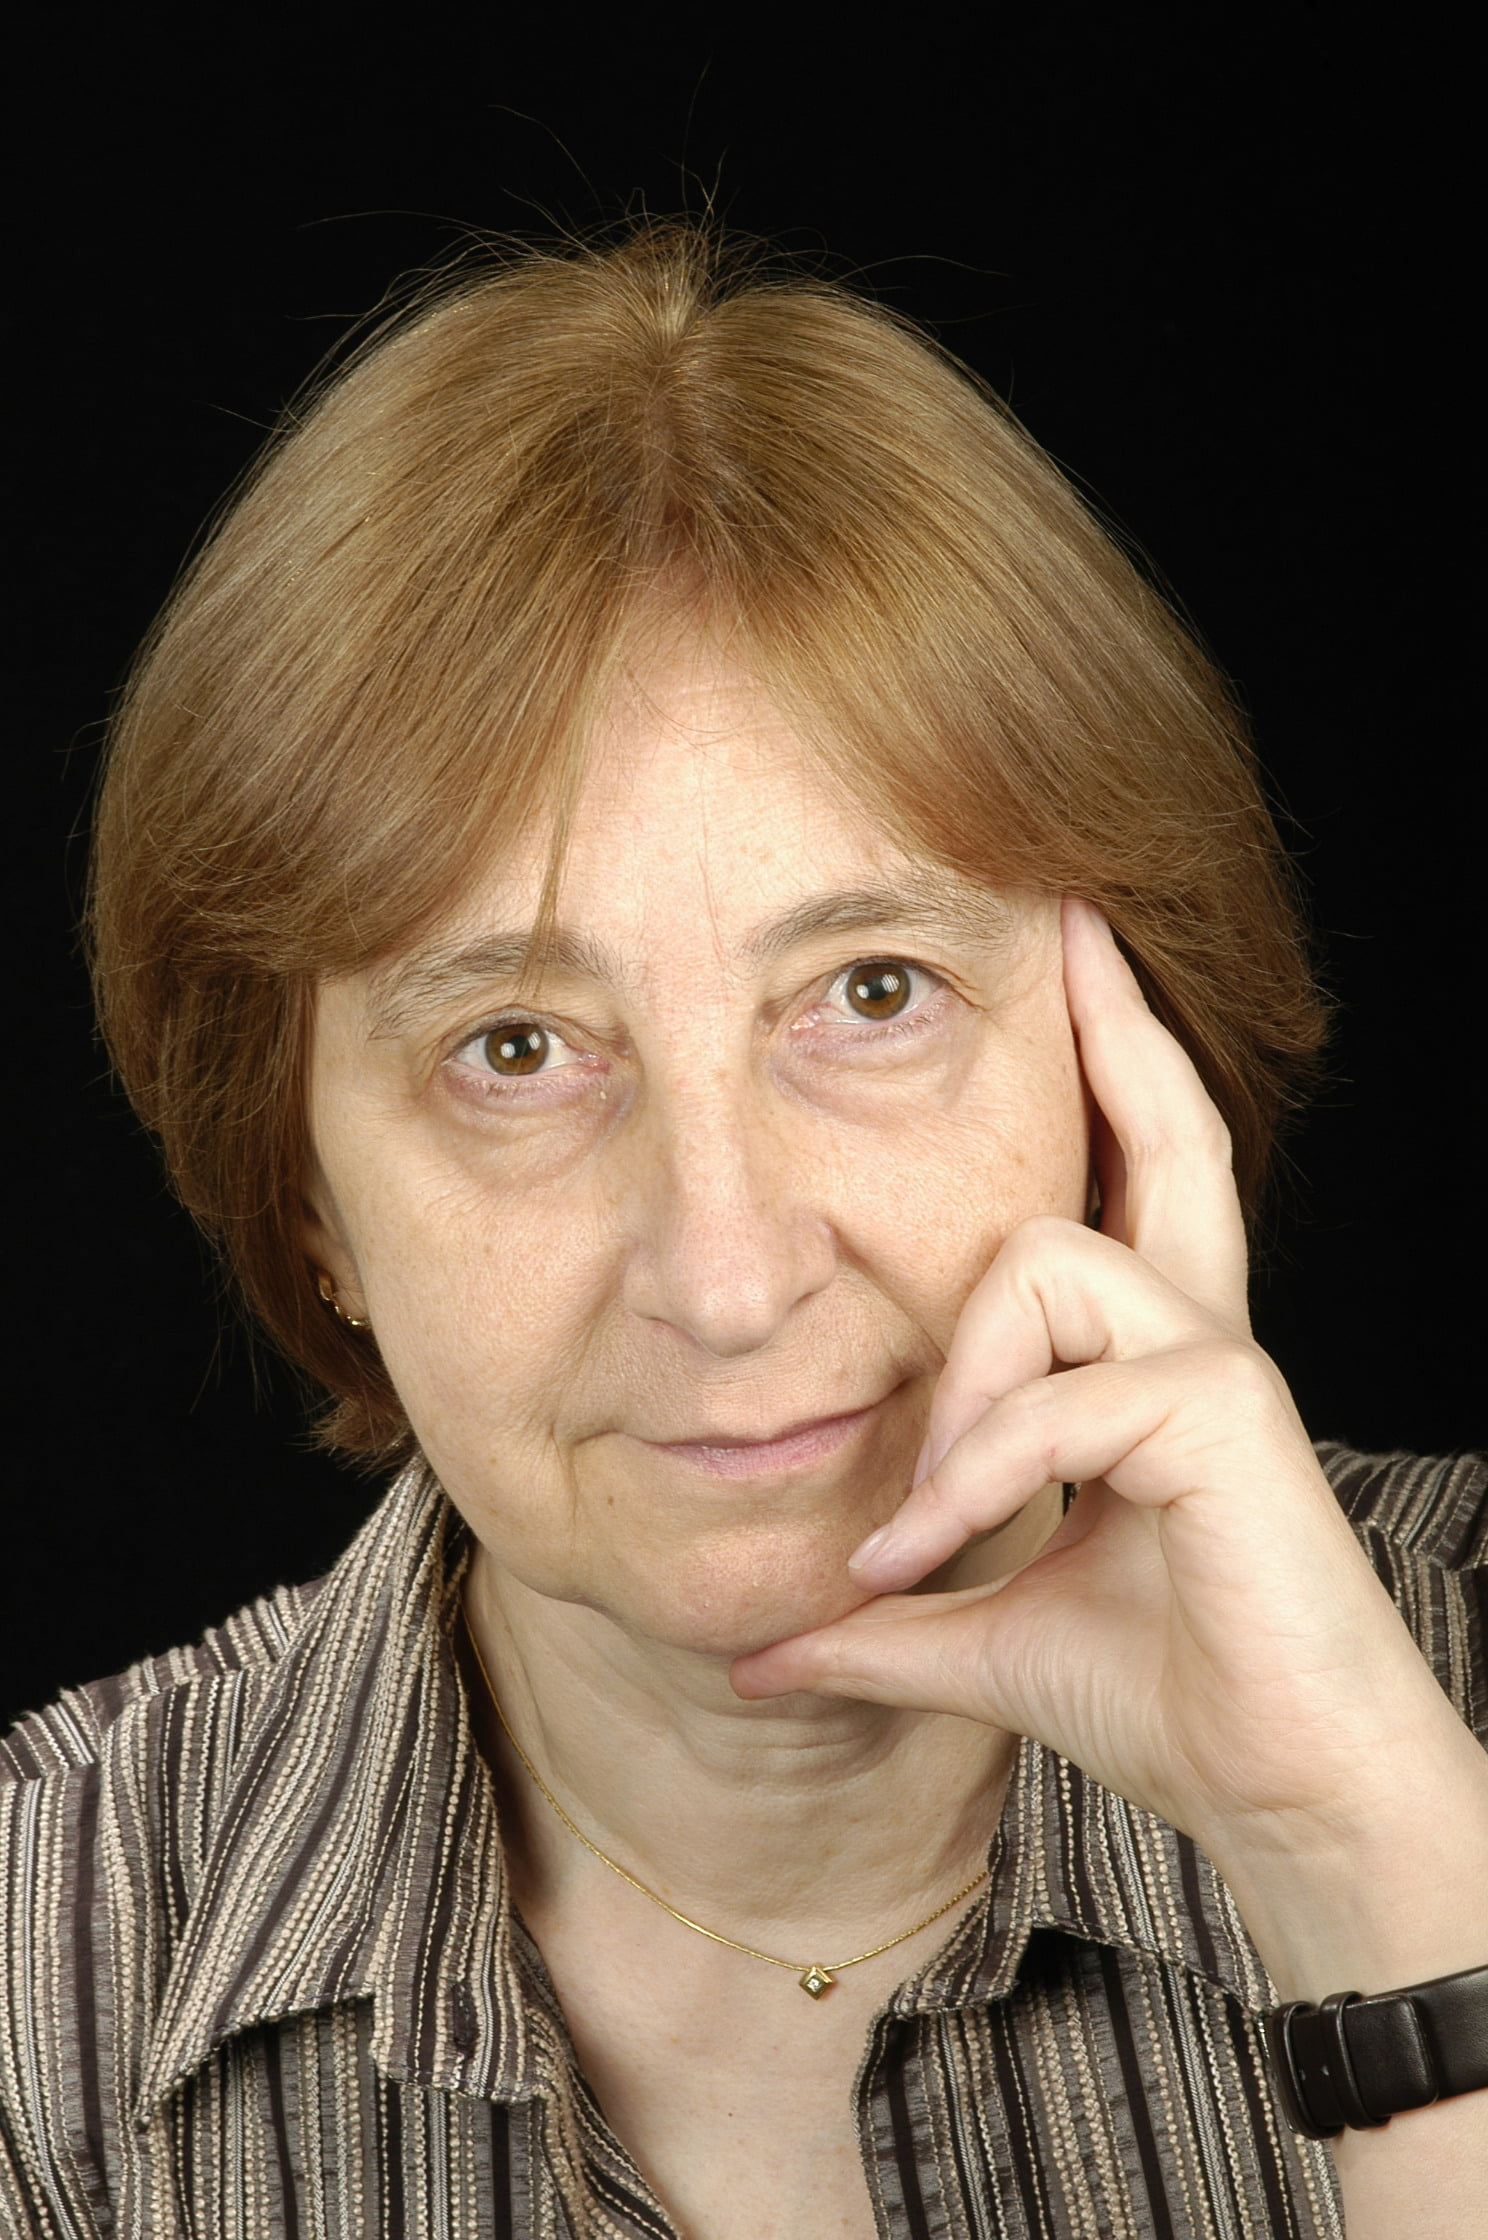 Dra. Montserrat Aguadé Porresº